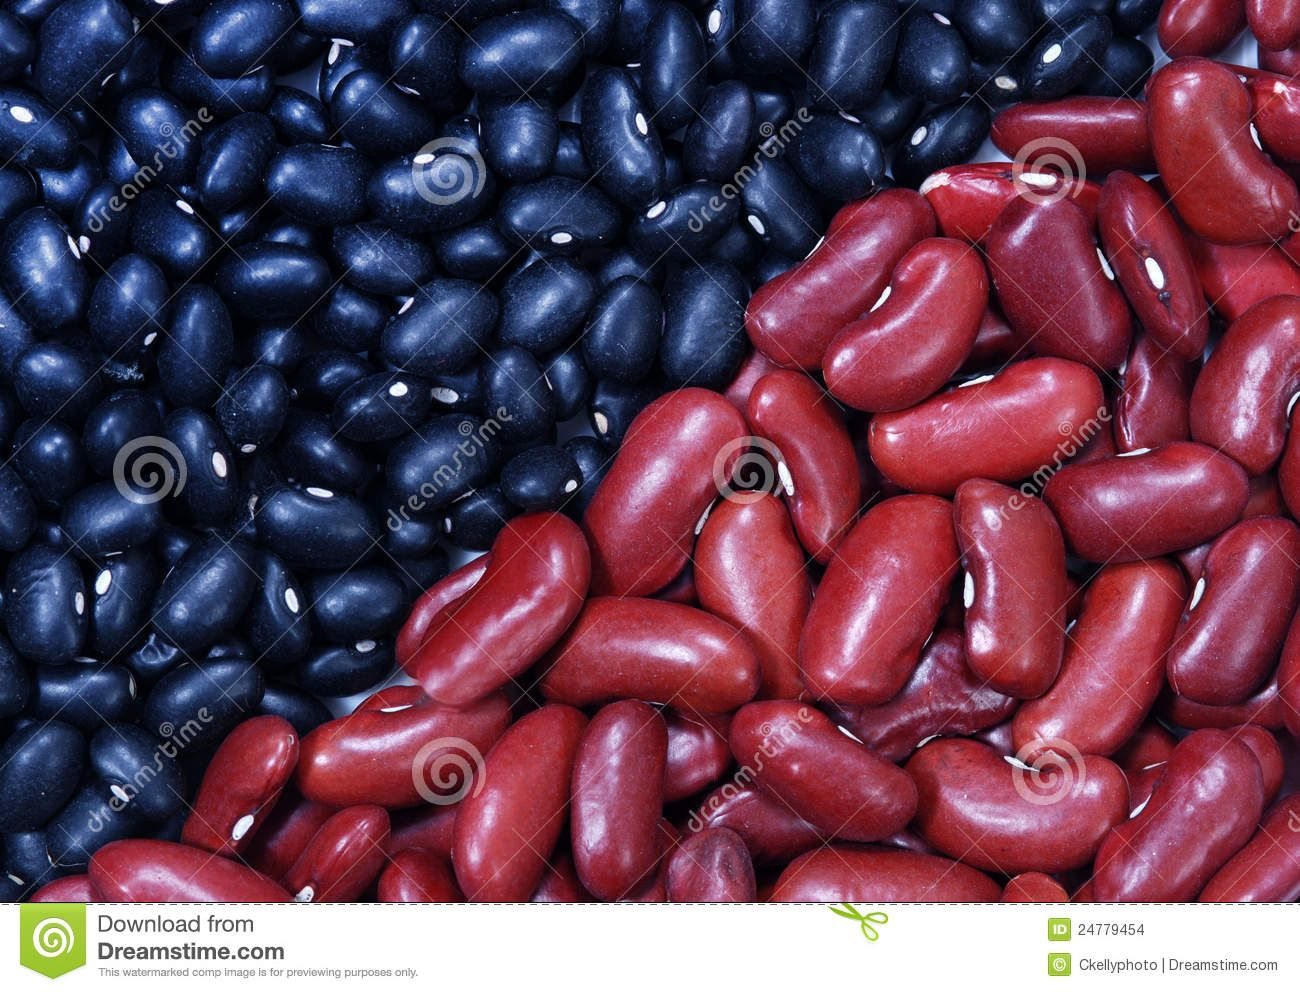 Kidney Shaped Foods Black Beans Kidney Beans Most Beans